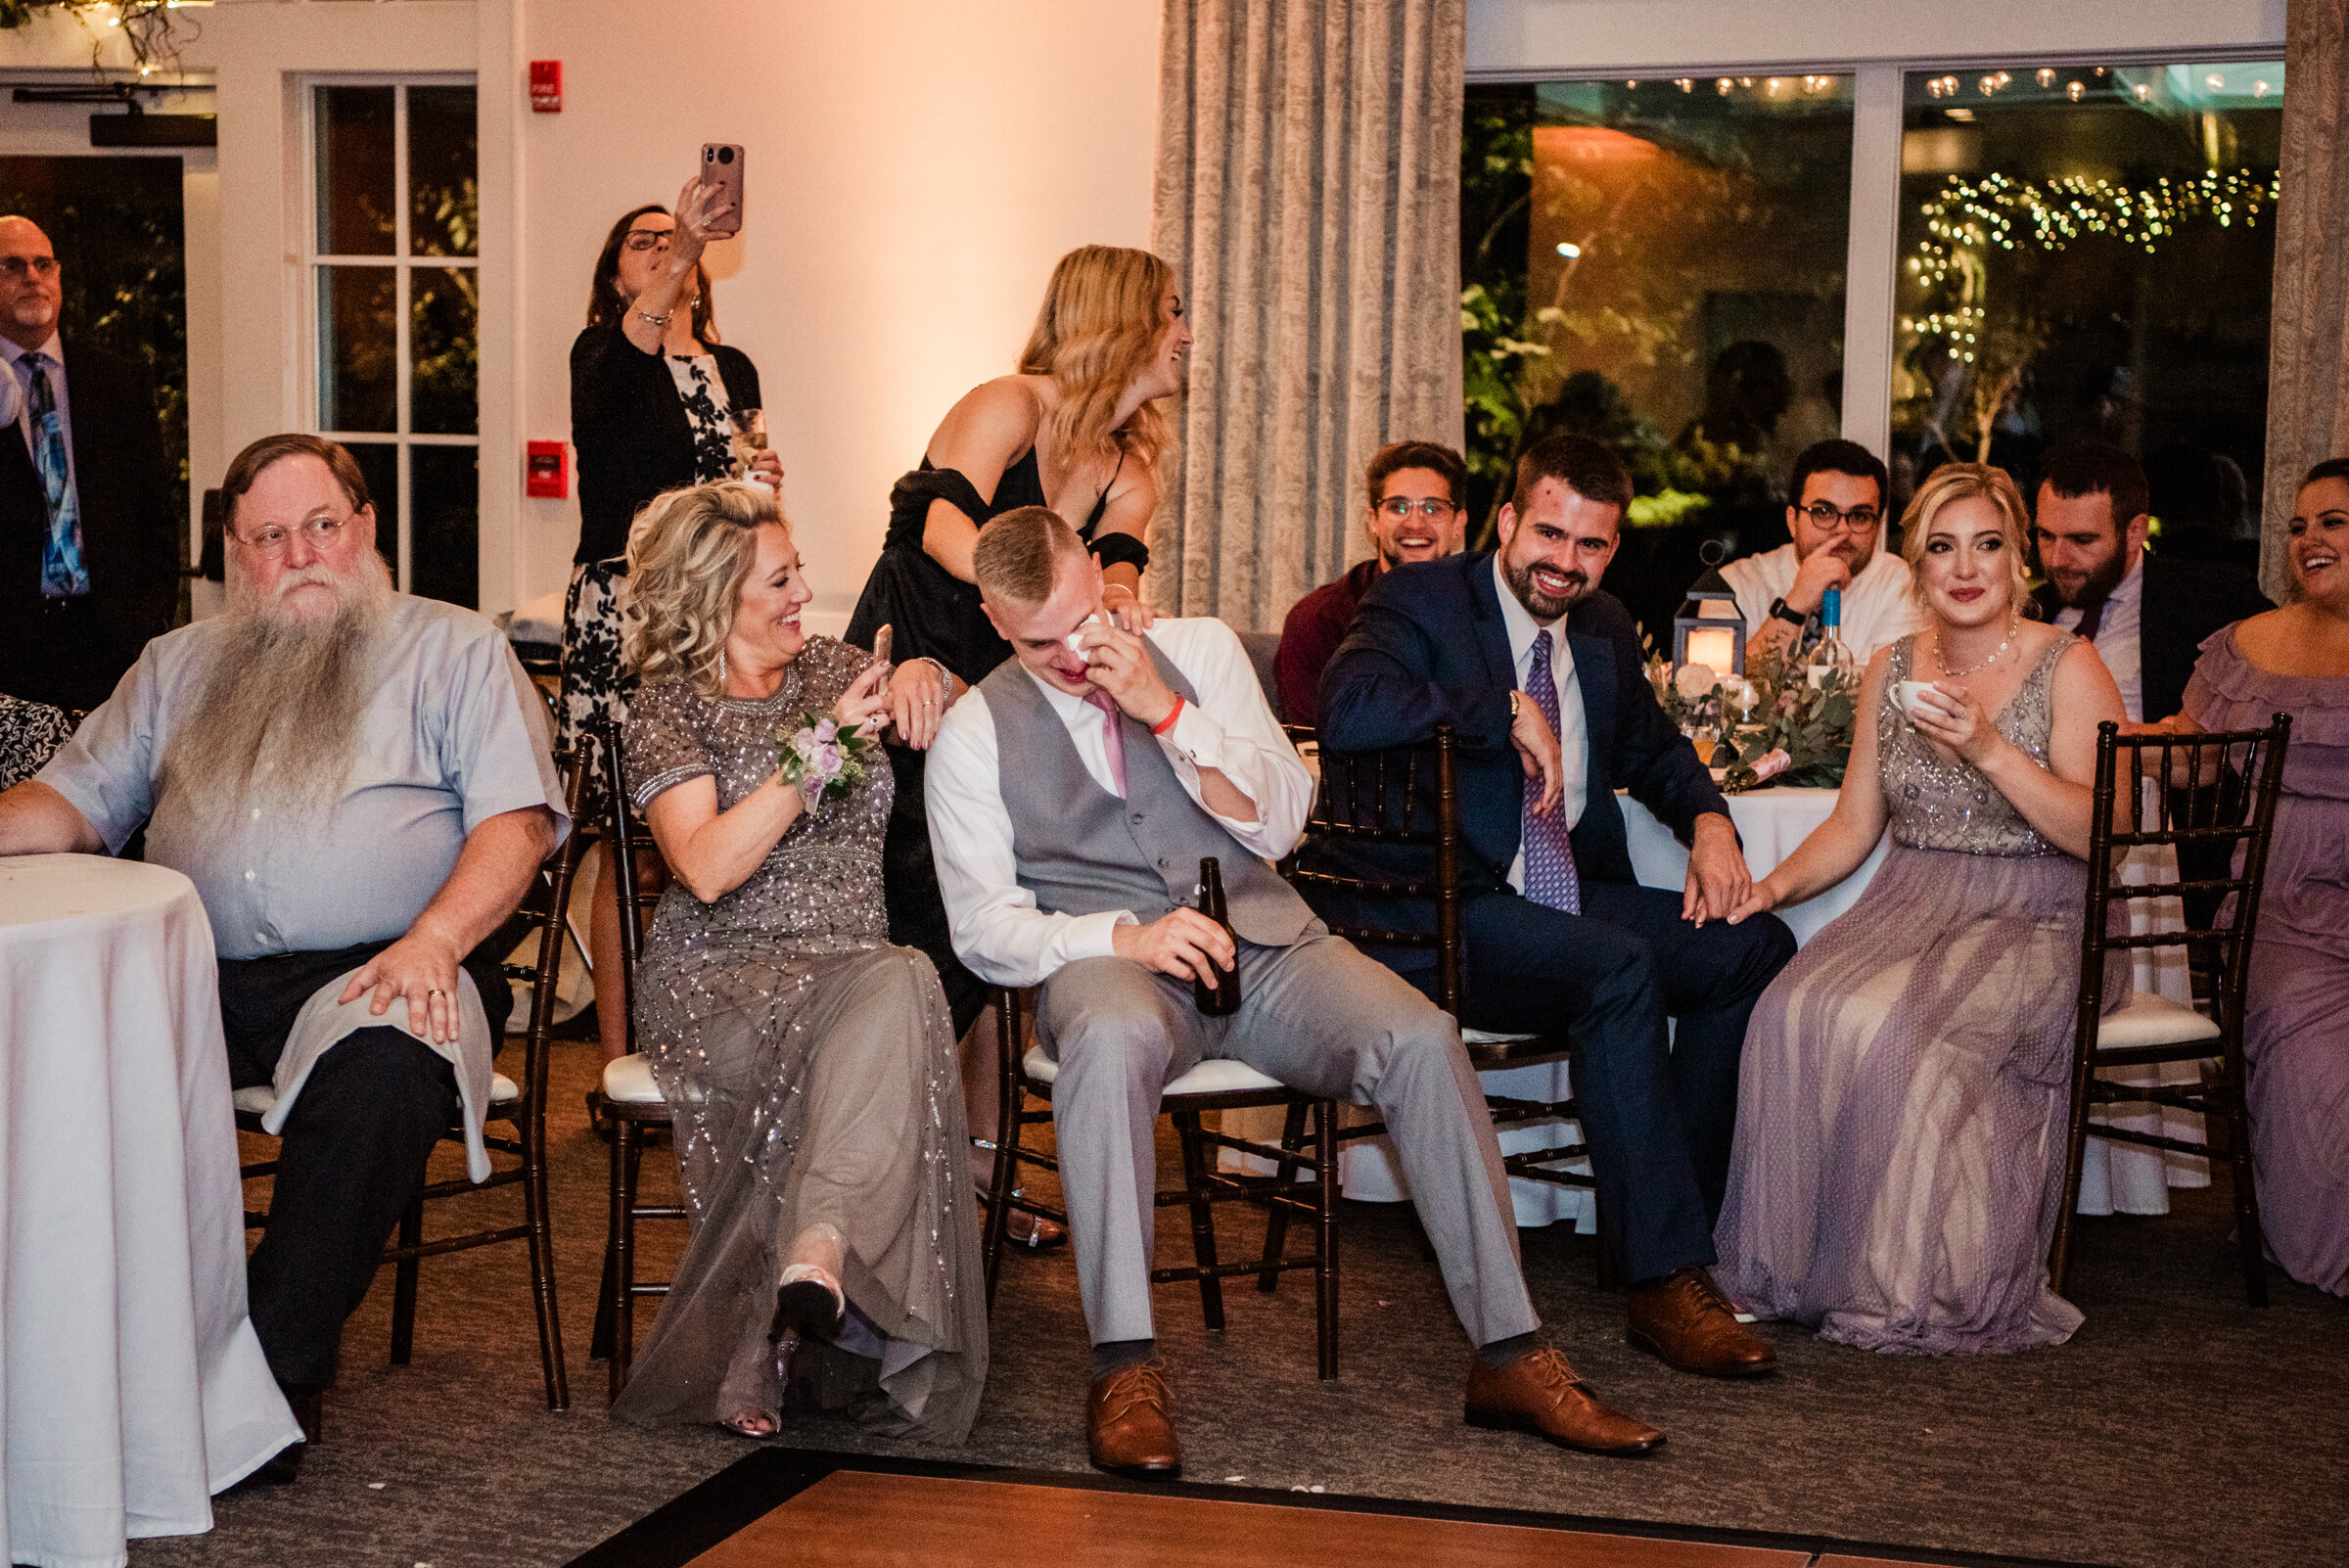 Deerfield_Country_Club_Rochester_Wedding_JILL_STUDIO_Rochester_NY_Photographer_DSC_7295.jpg